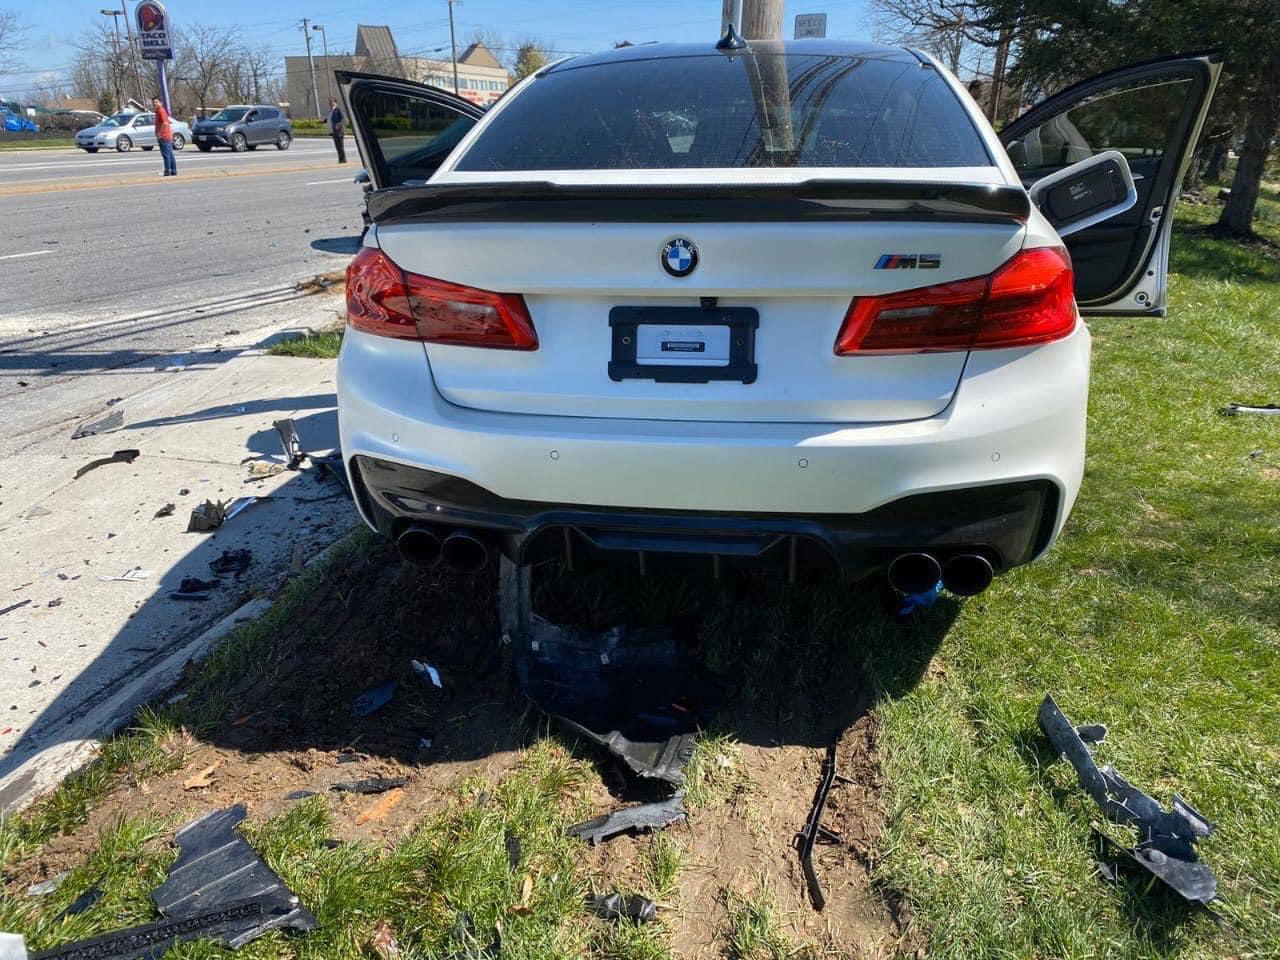 BMW_M5_accident_0002